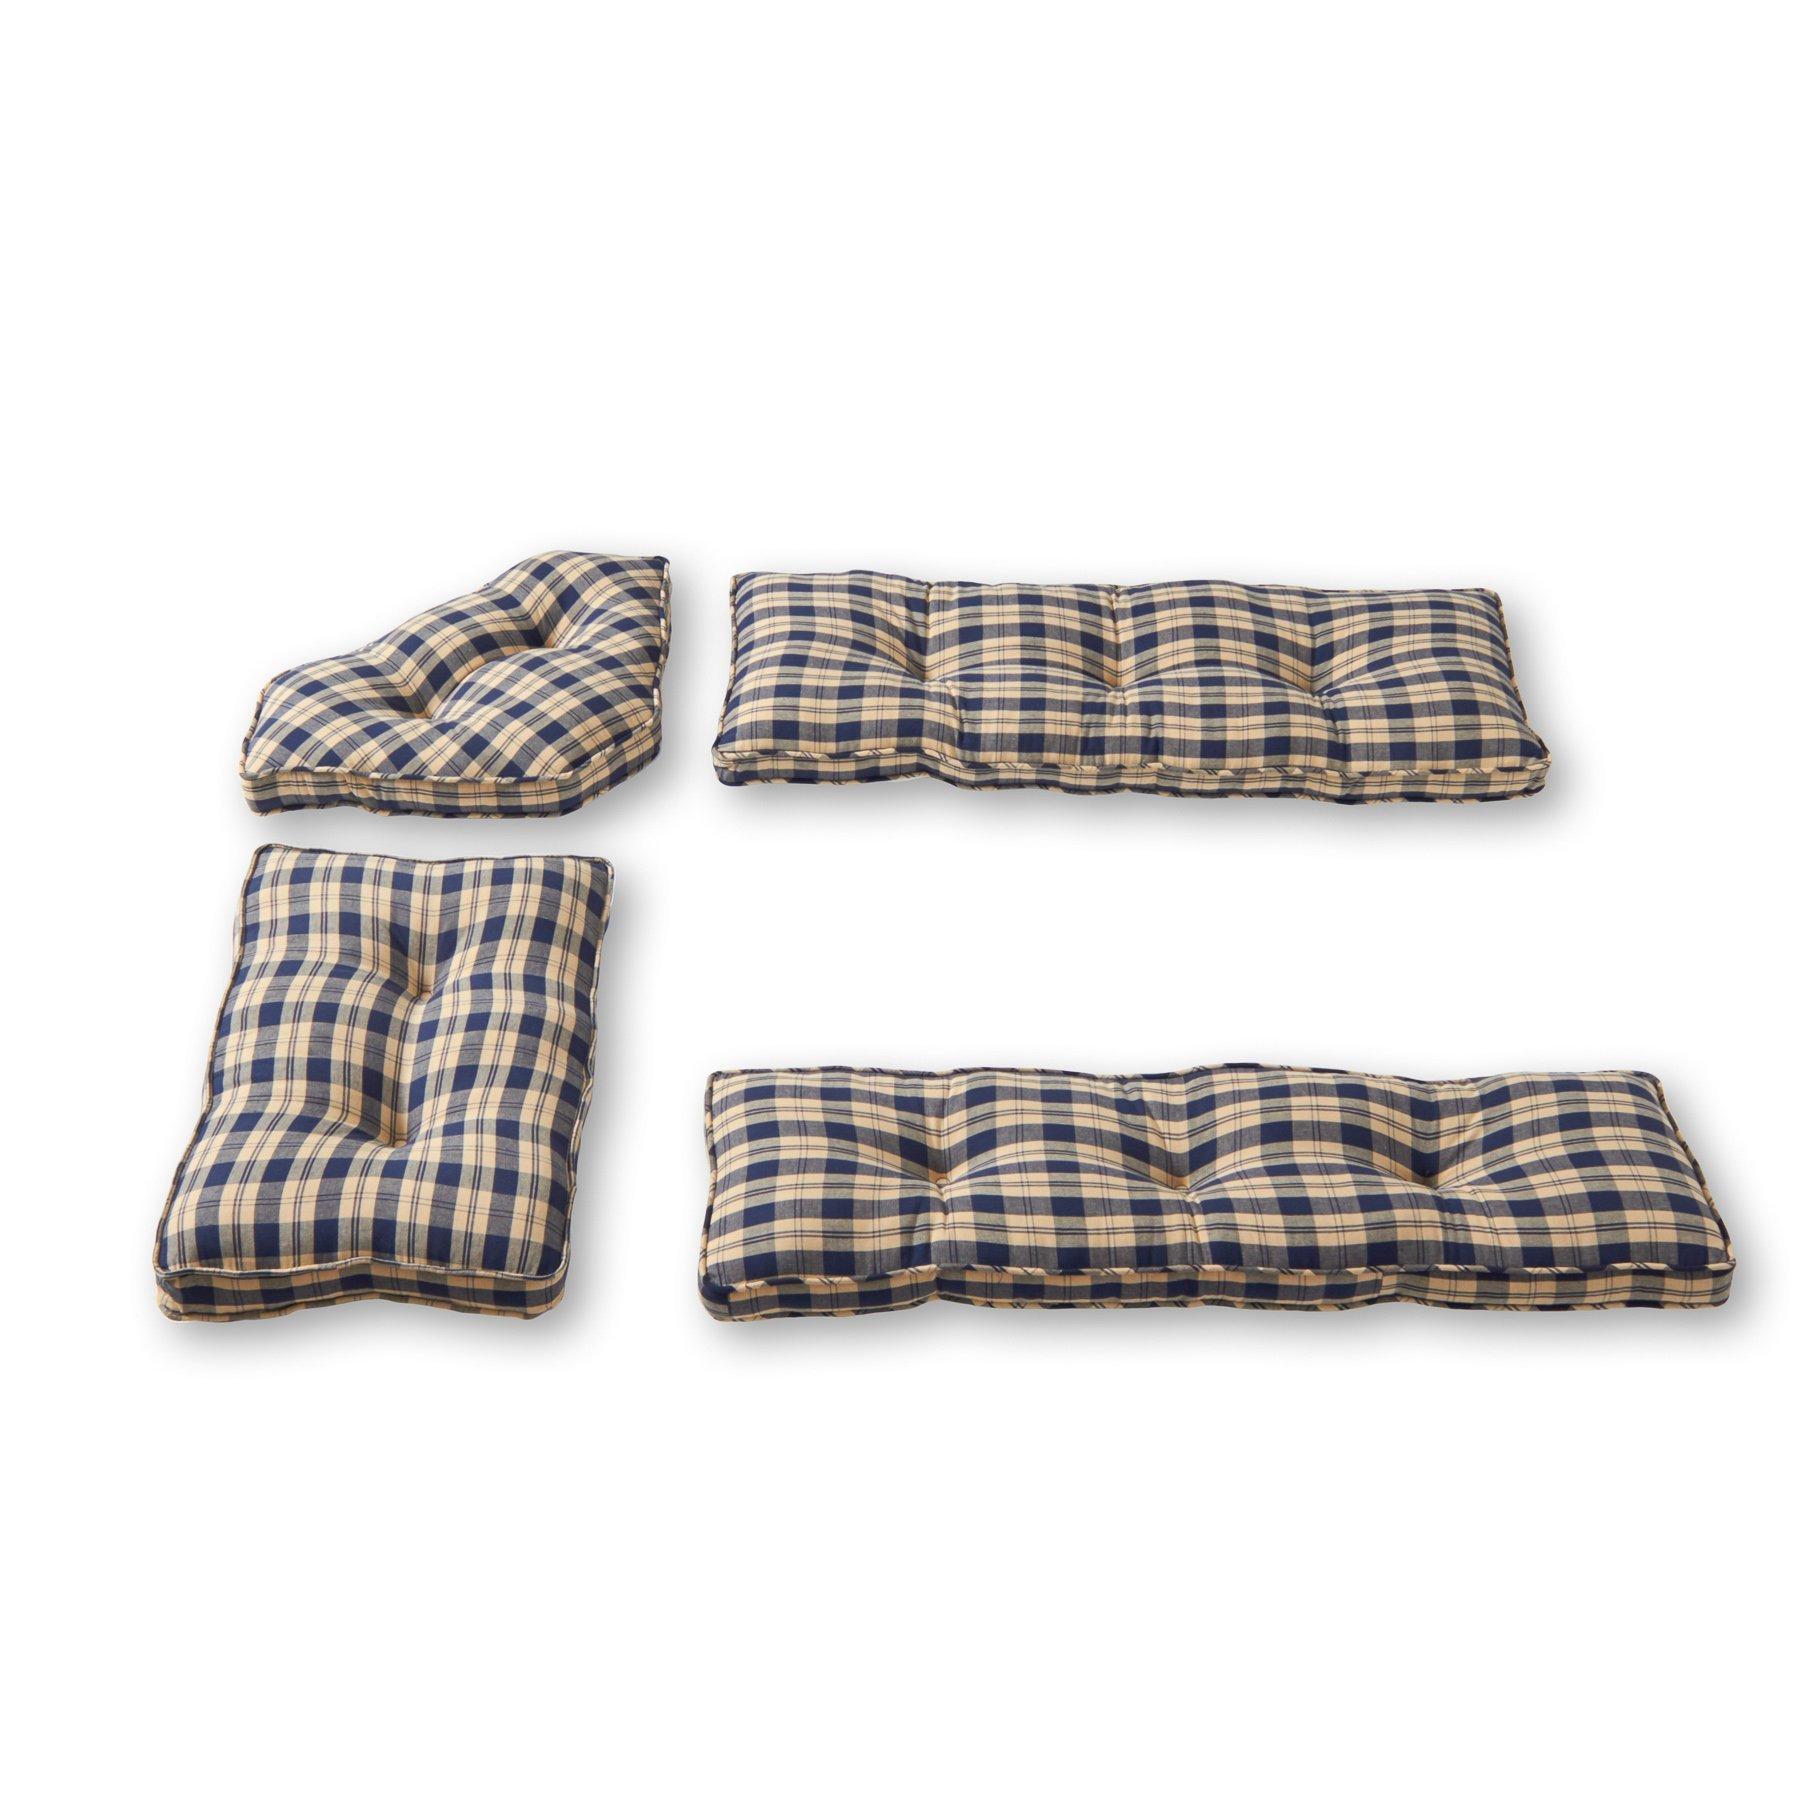 Greendale Home Fashions 4-Piece Nook Cushion Set, Applegate Plaid , Navy Blue by Greendale Home Fashions